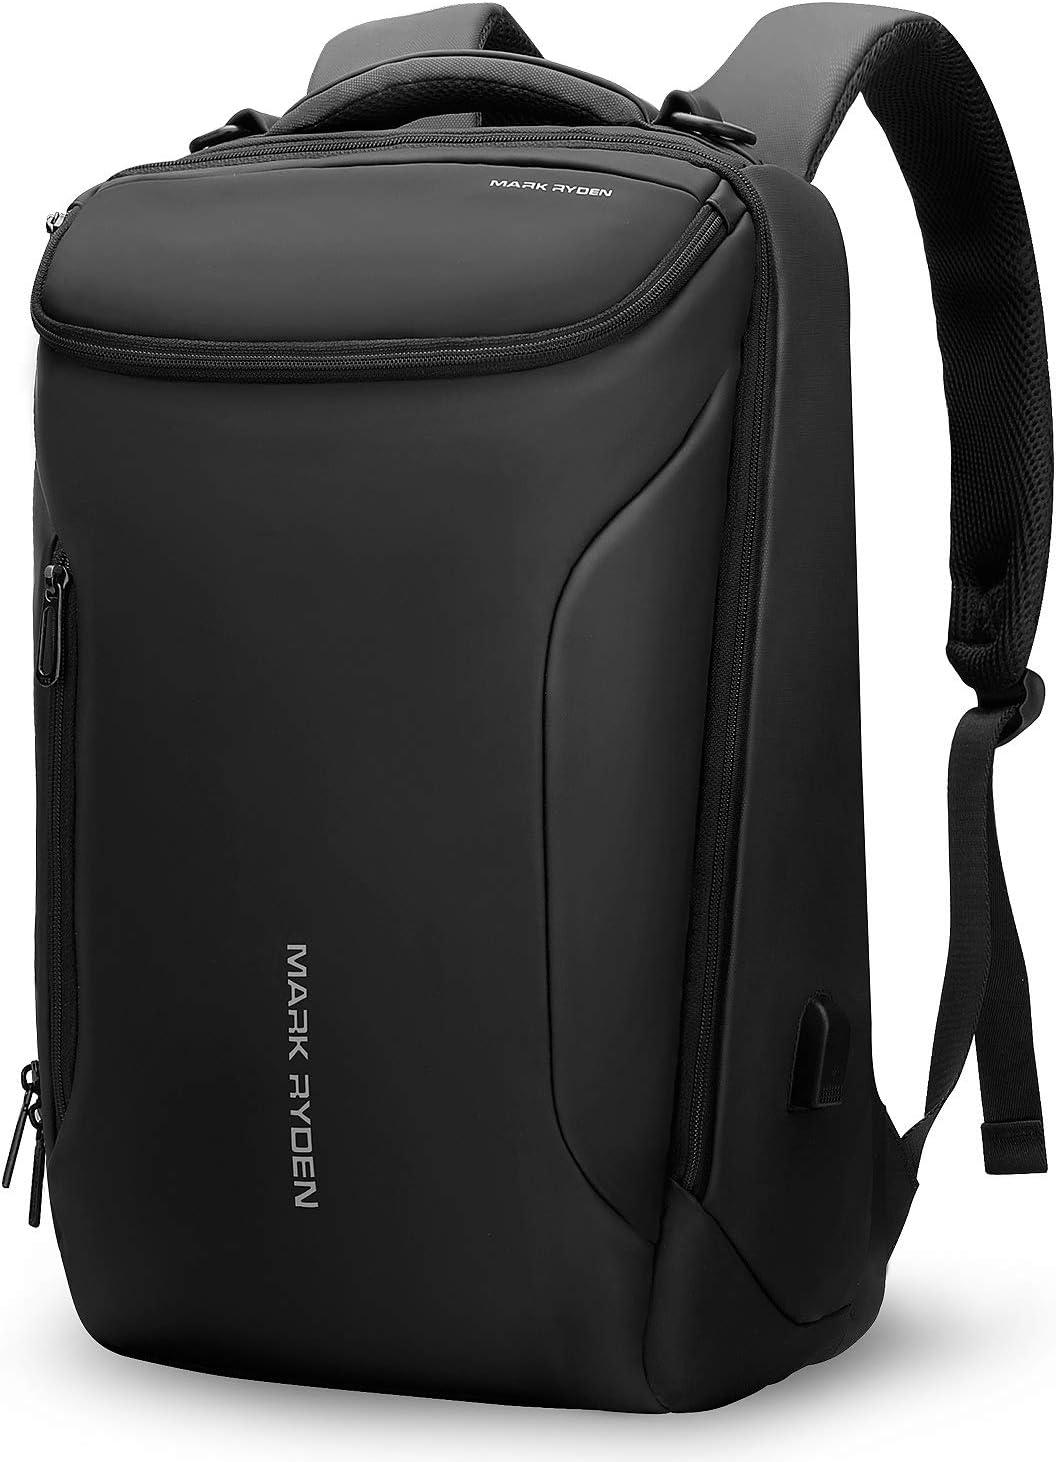 Markryden Water repellent Business laptop Backpack for School Travel Work Fits 17.3 Laptop (YKK-2 Pocket)